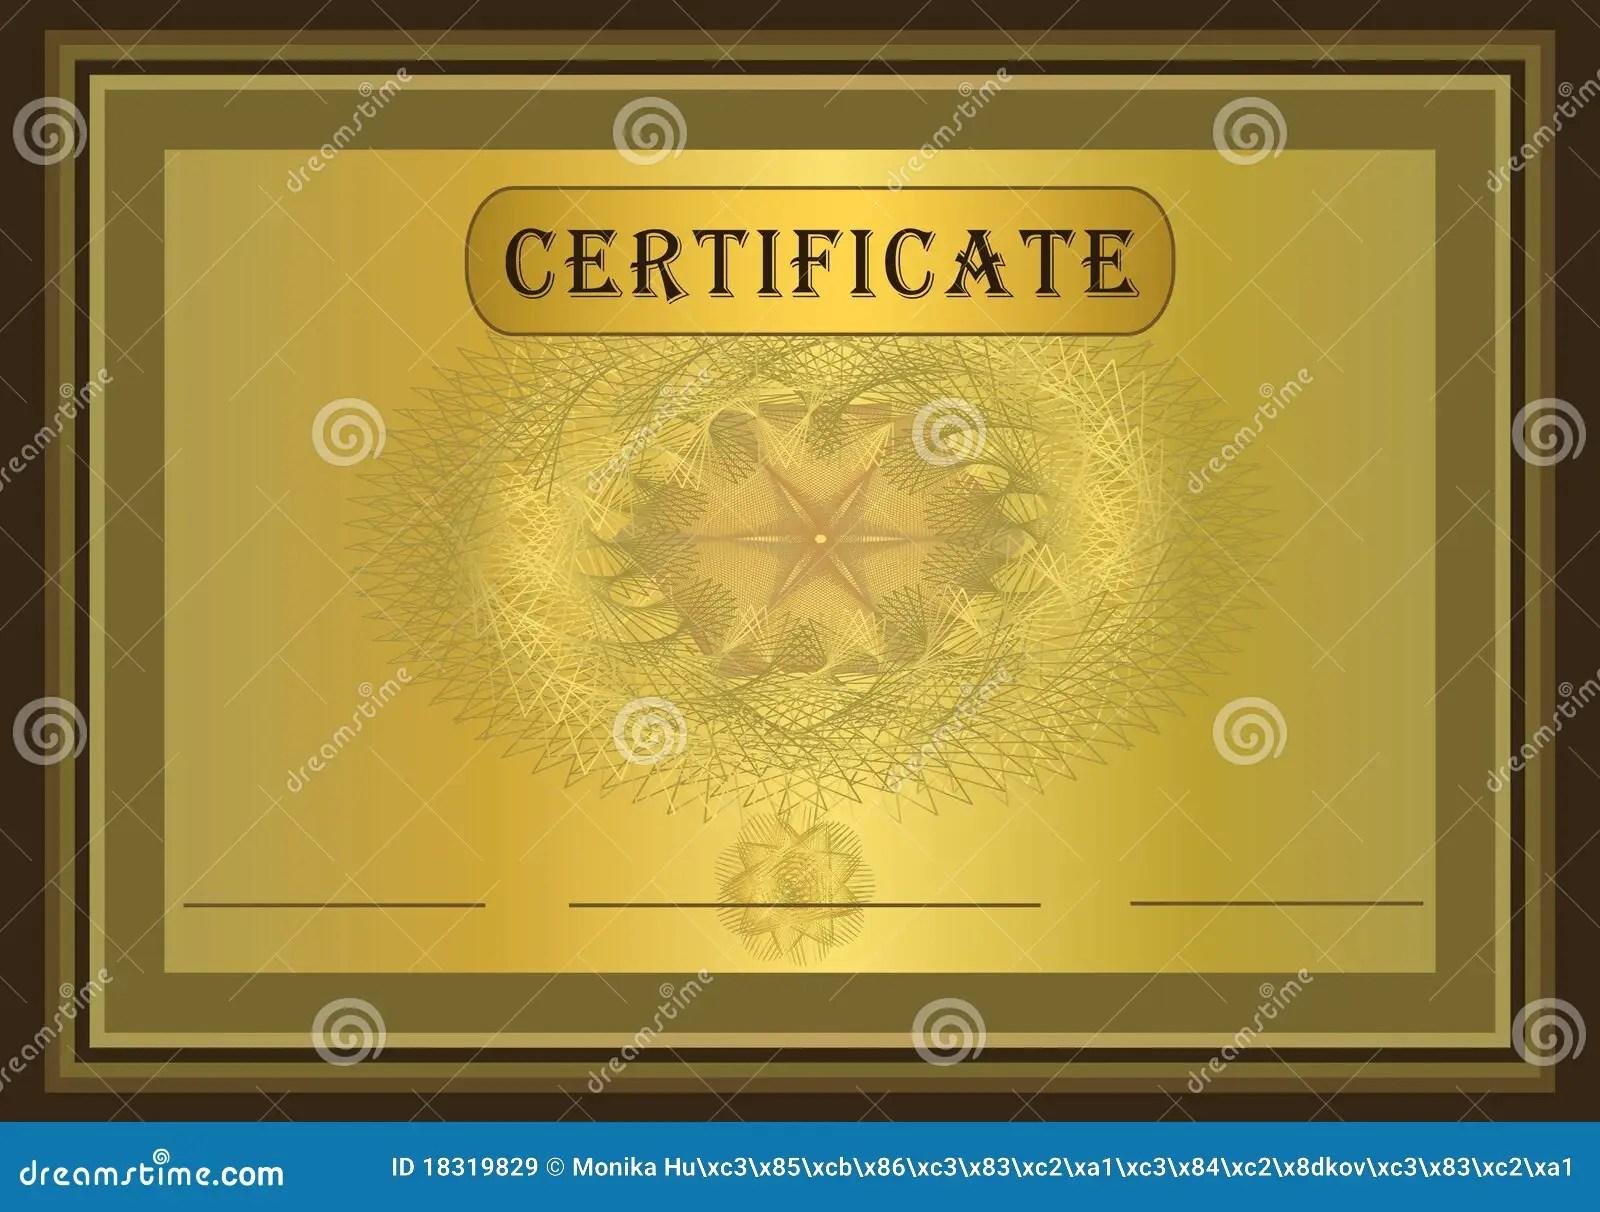 Certificate Gold Brown Stock Vector Illustration Of Design 18319829